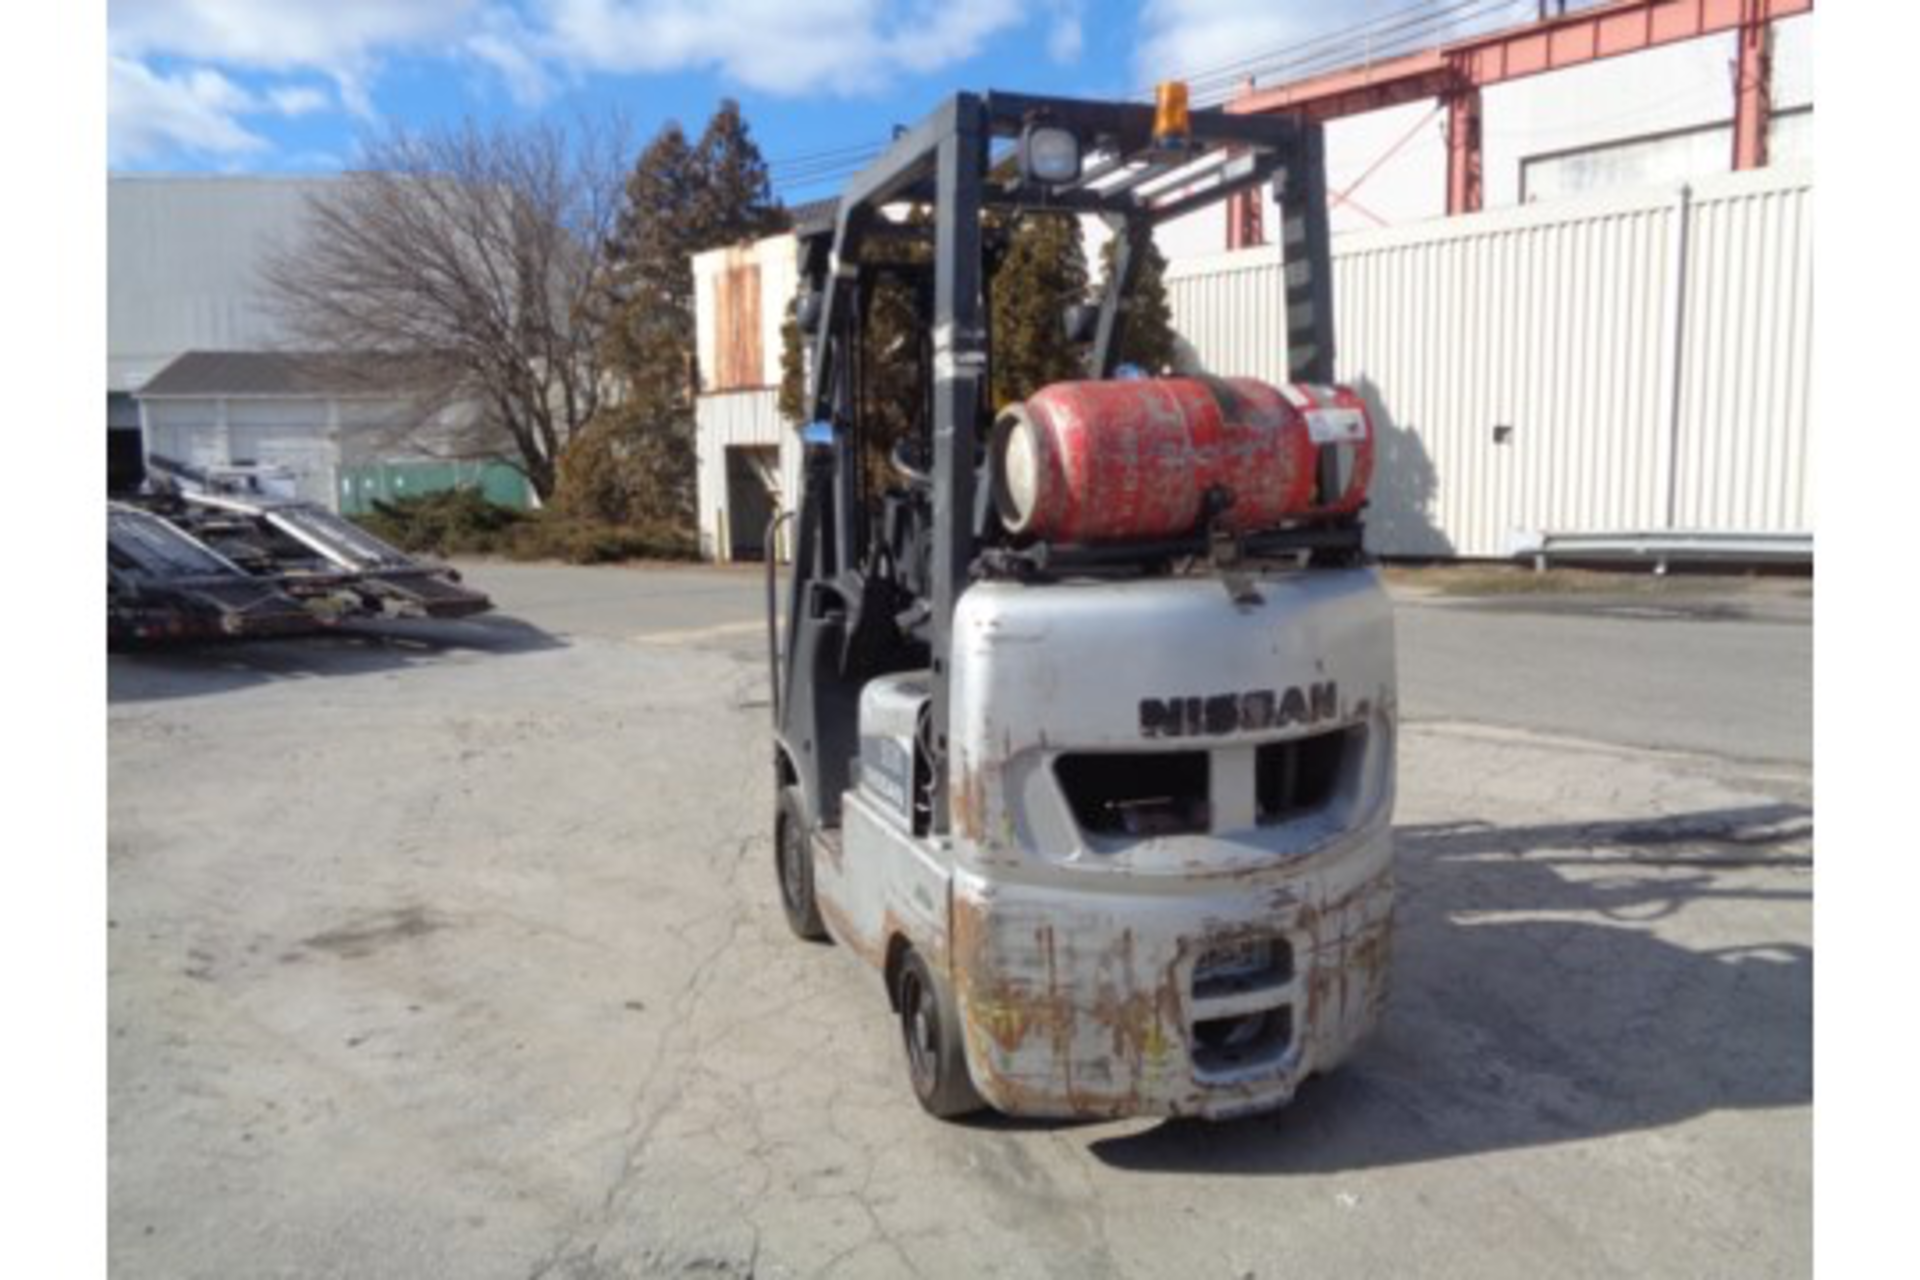 Nissan MCPL01A18LV 3500lb Forklift - Image 9 of 16